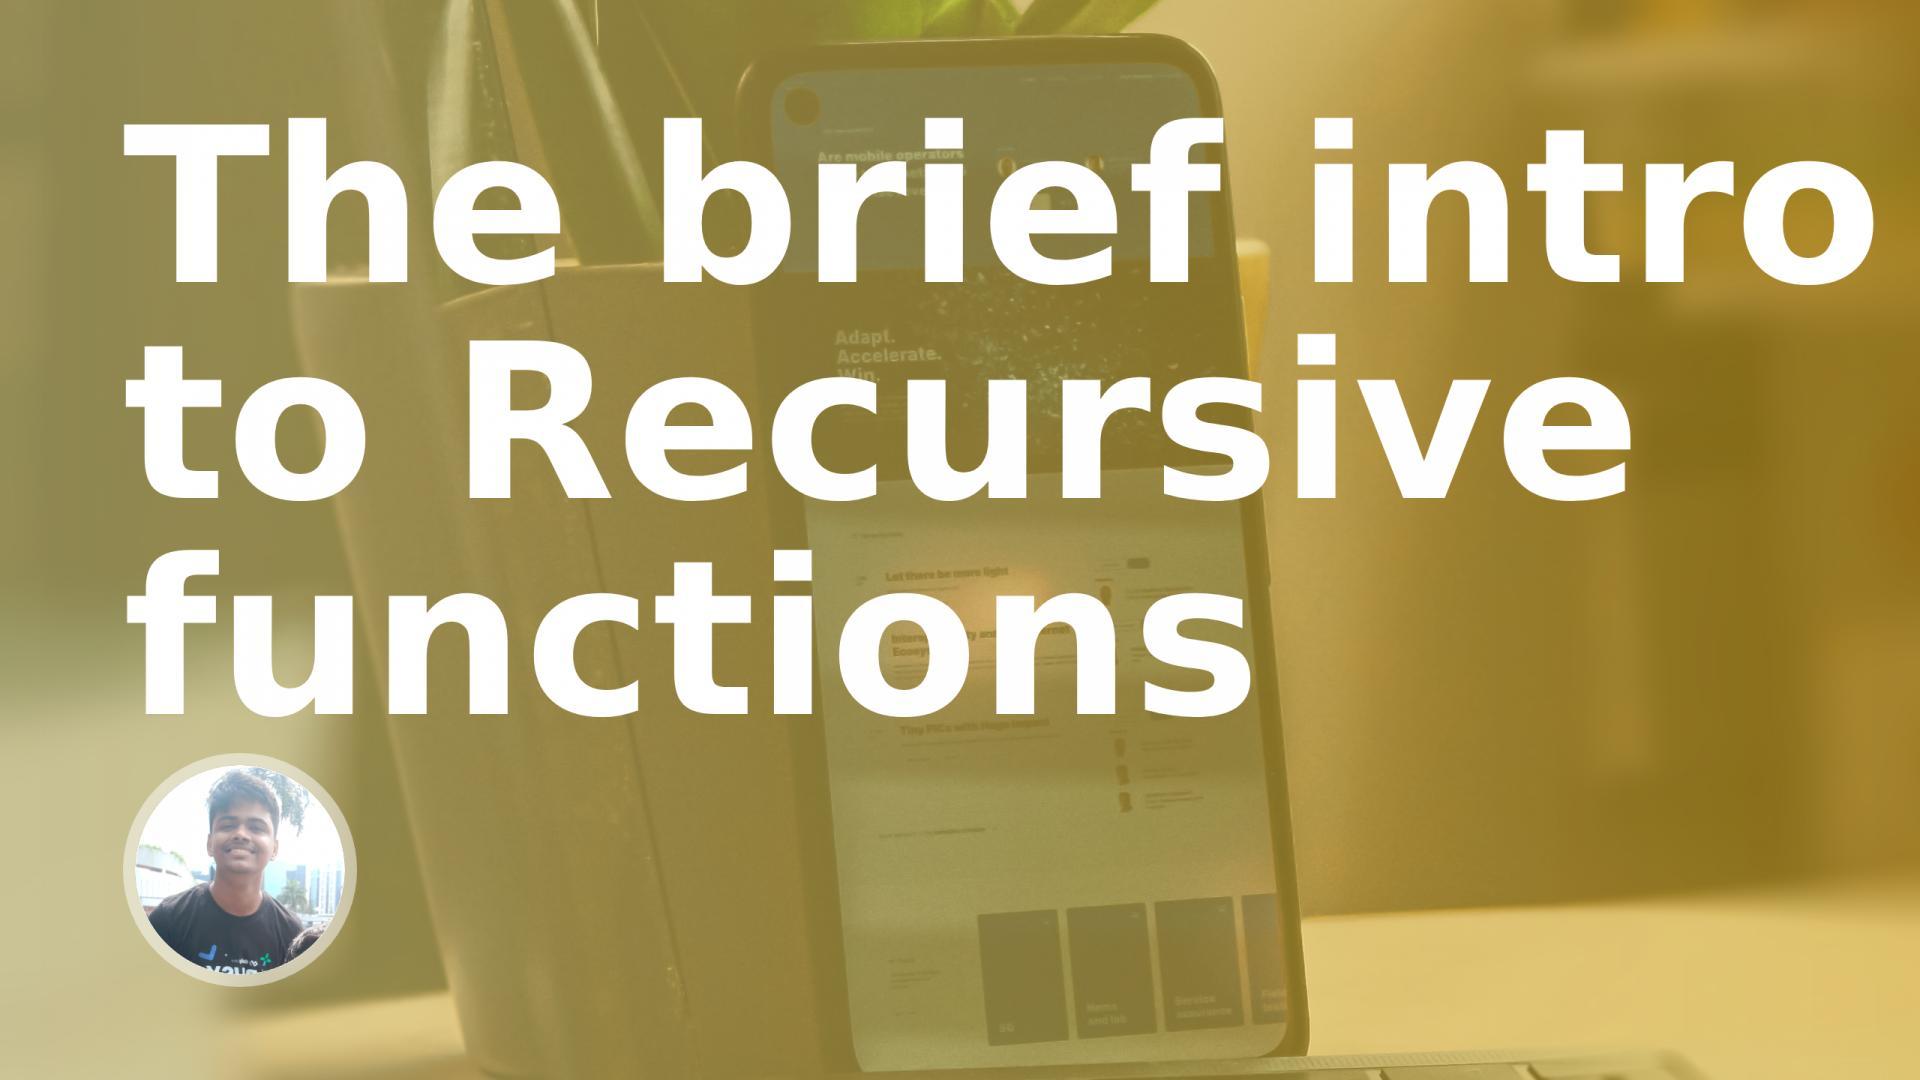 The brief intro to Recursive functions